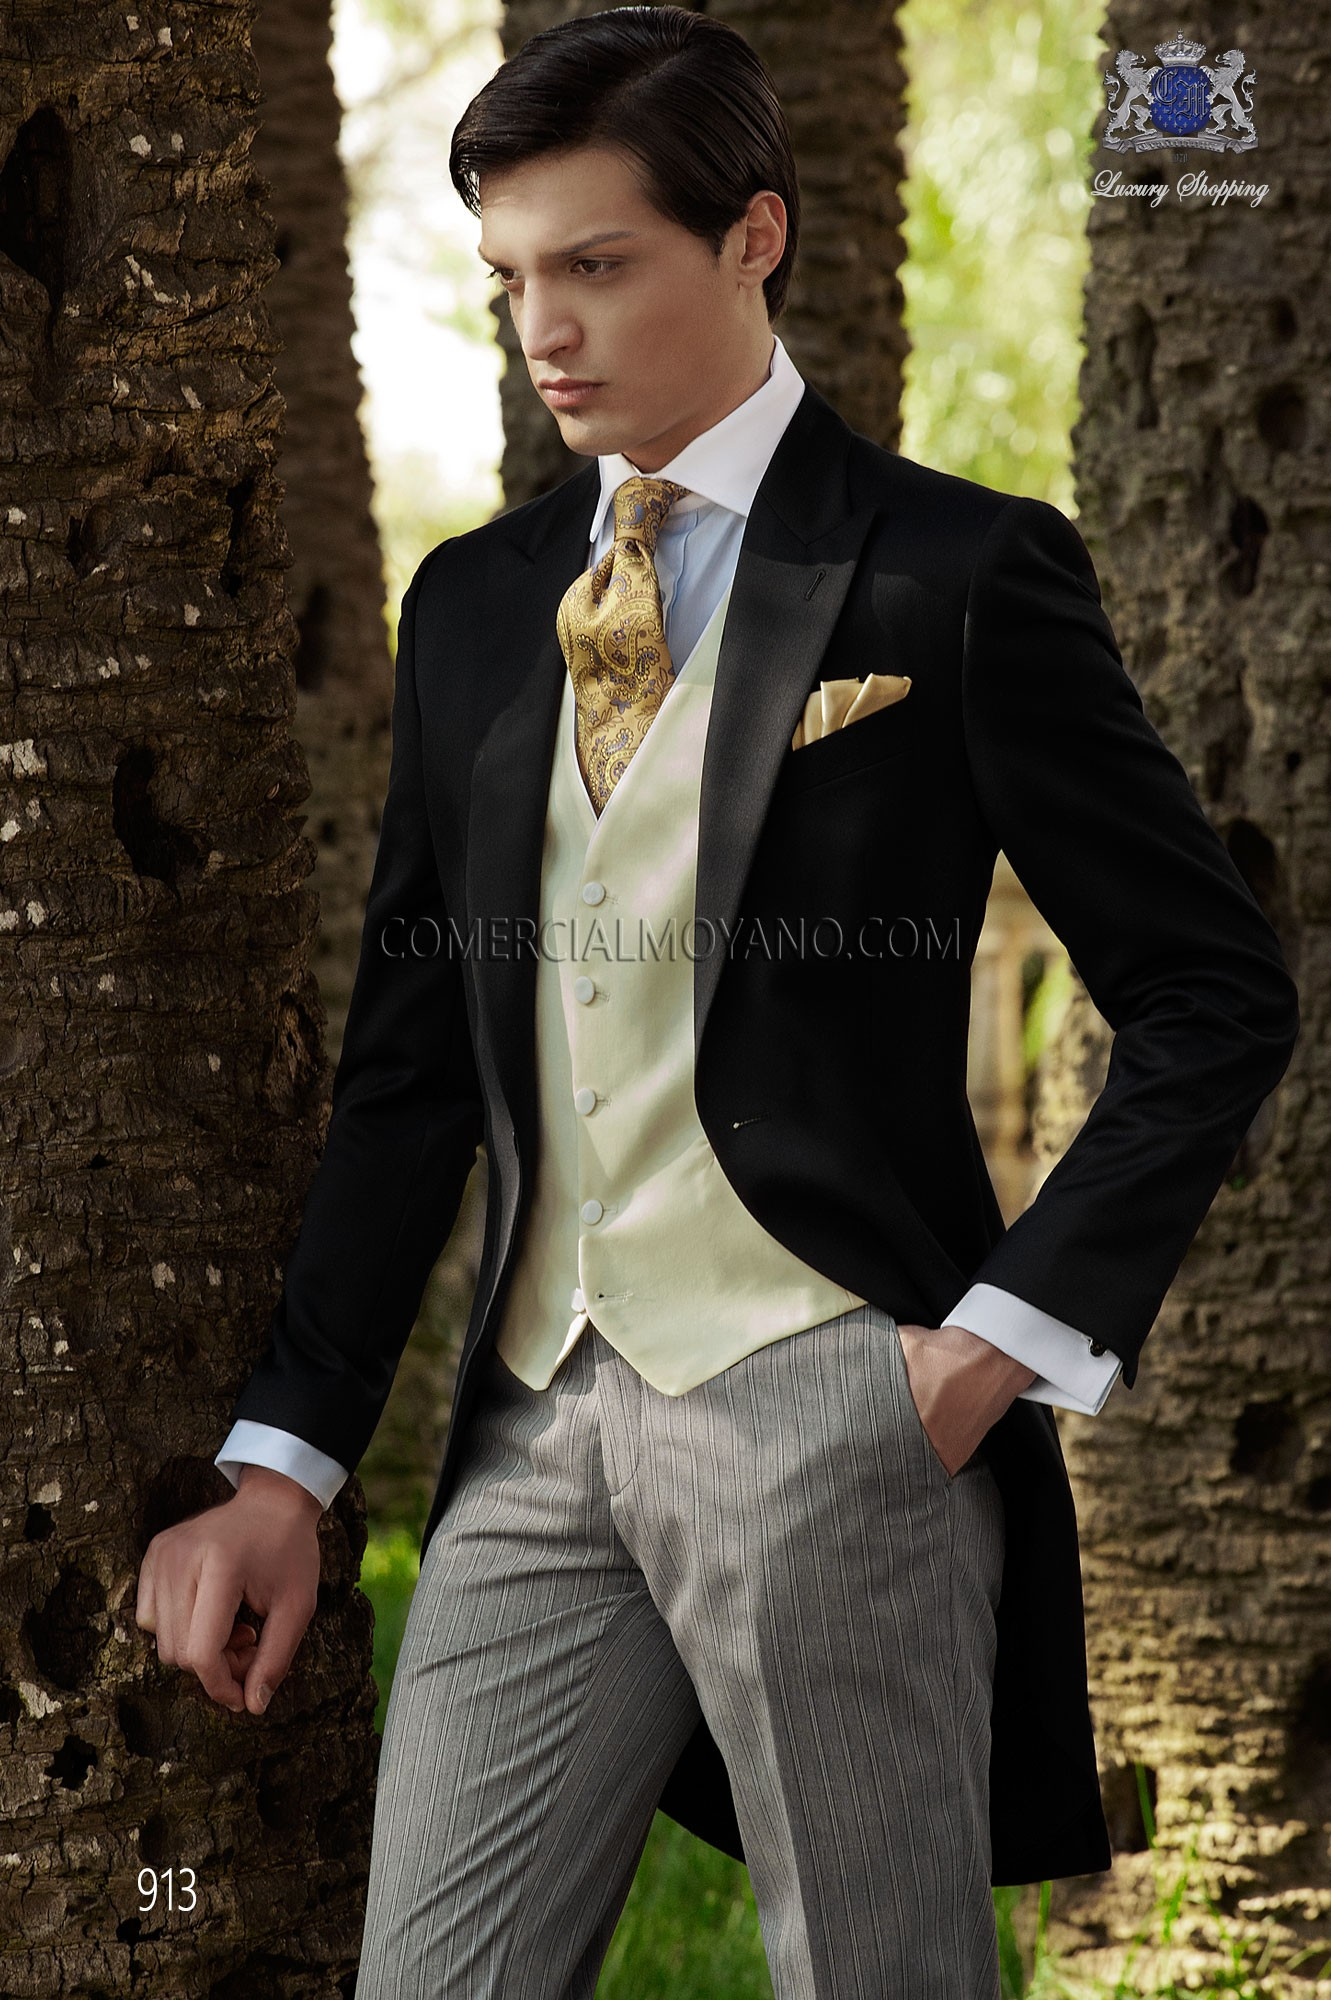 Italian Bespoke Black Wedding Morning Suit 913 Ottavio